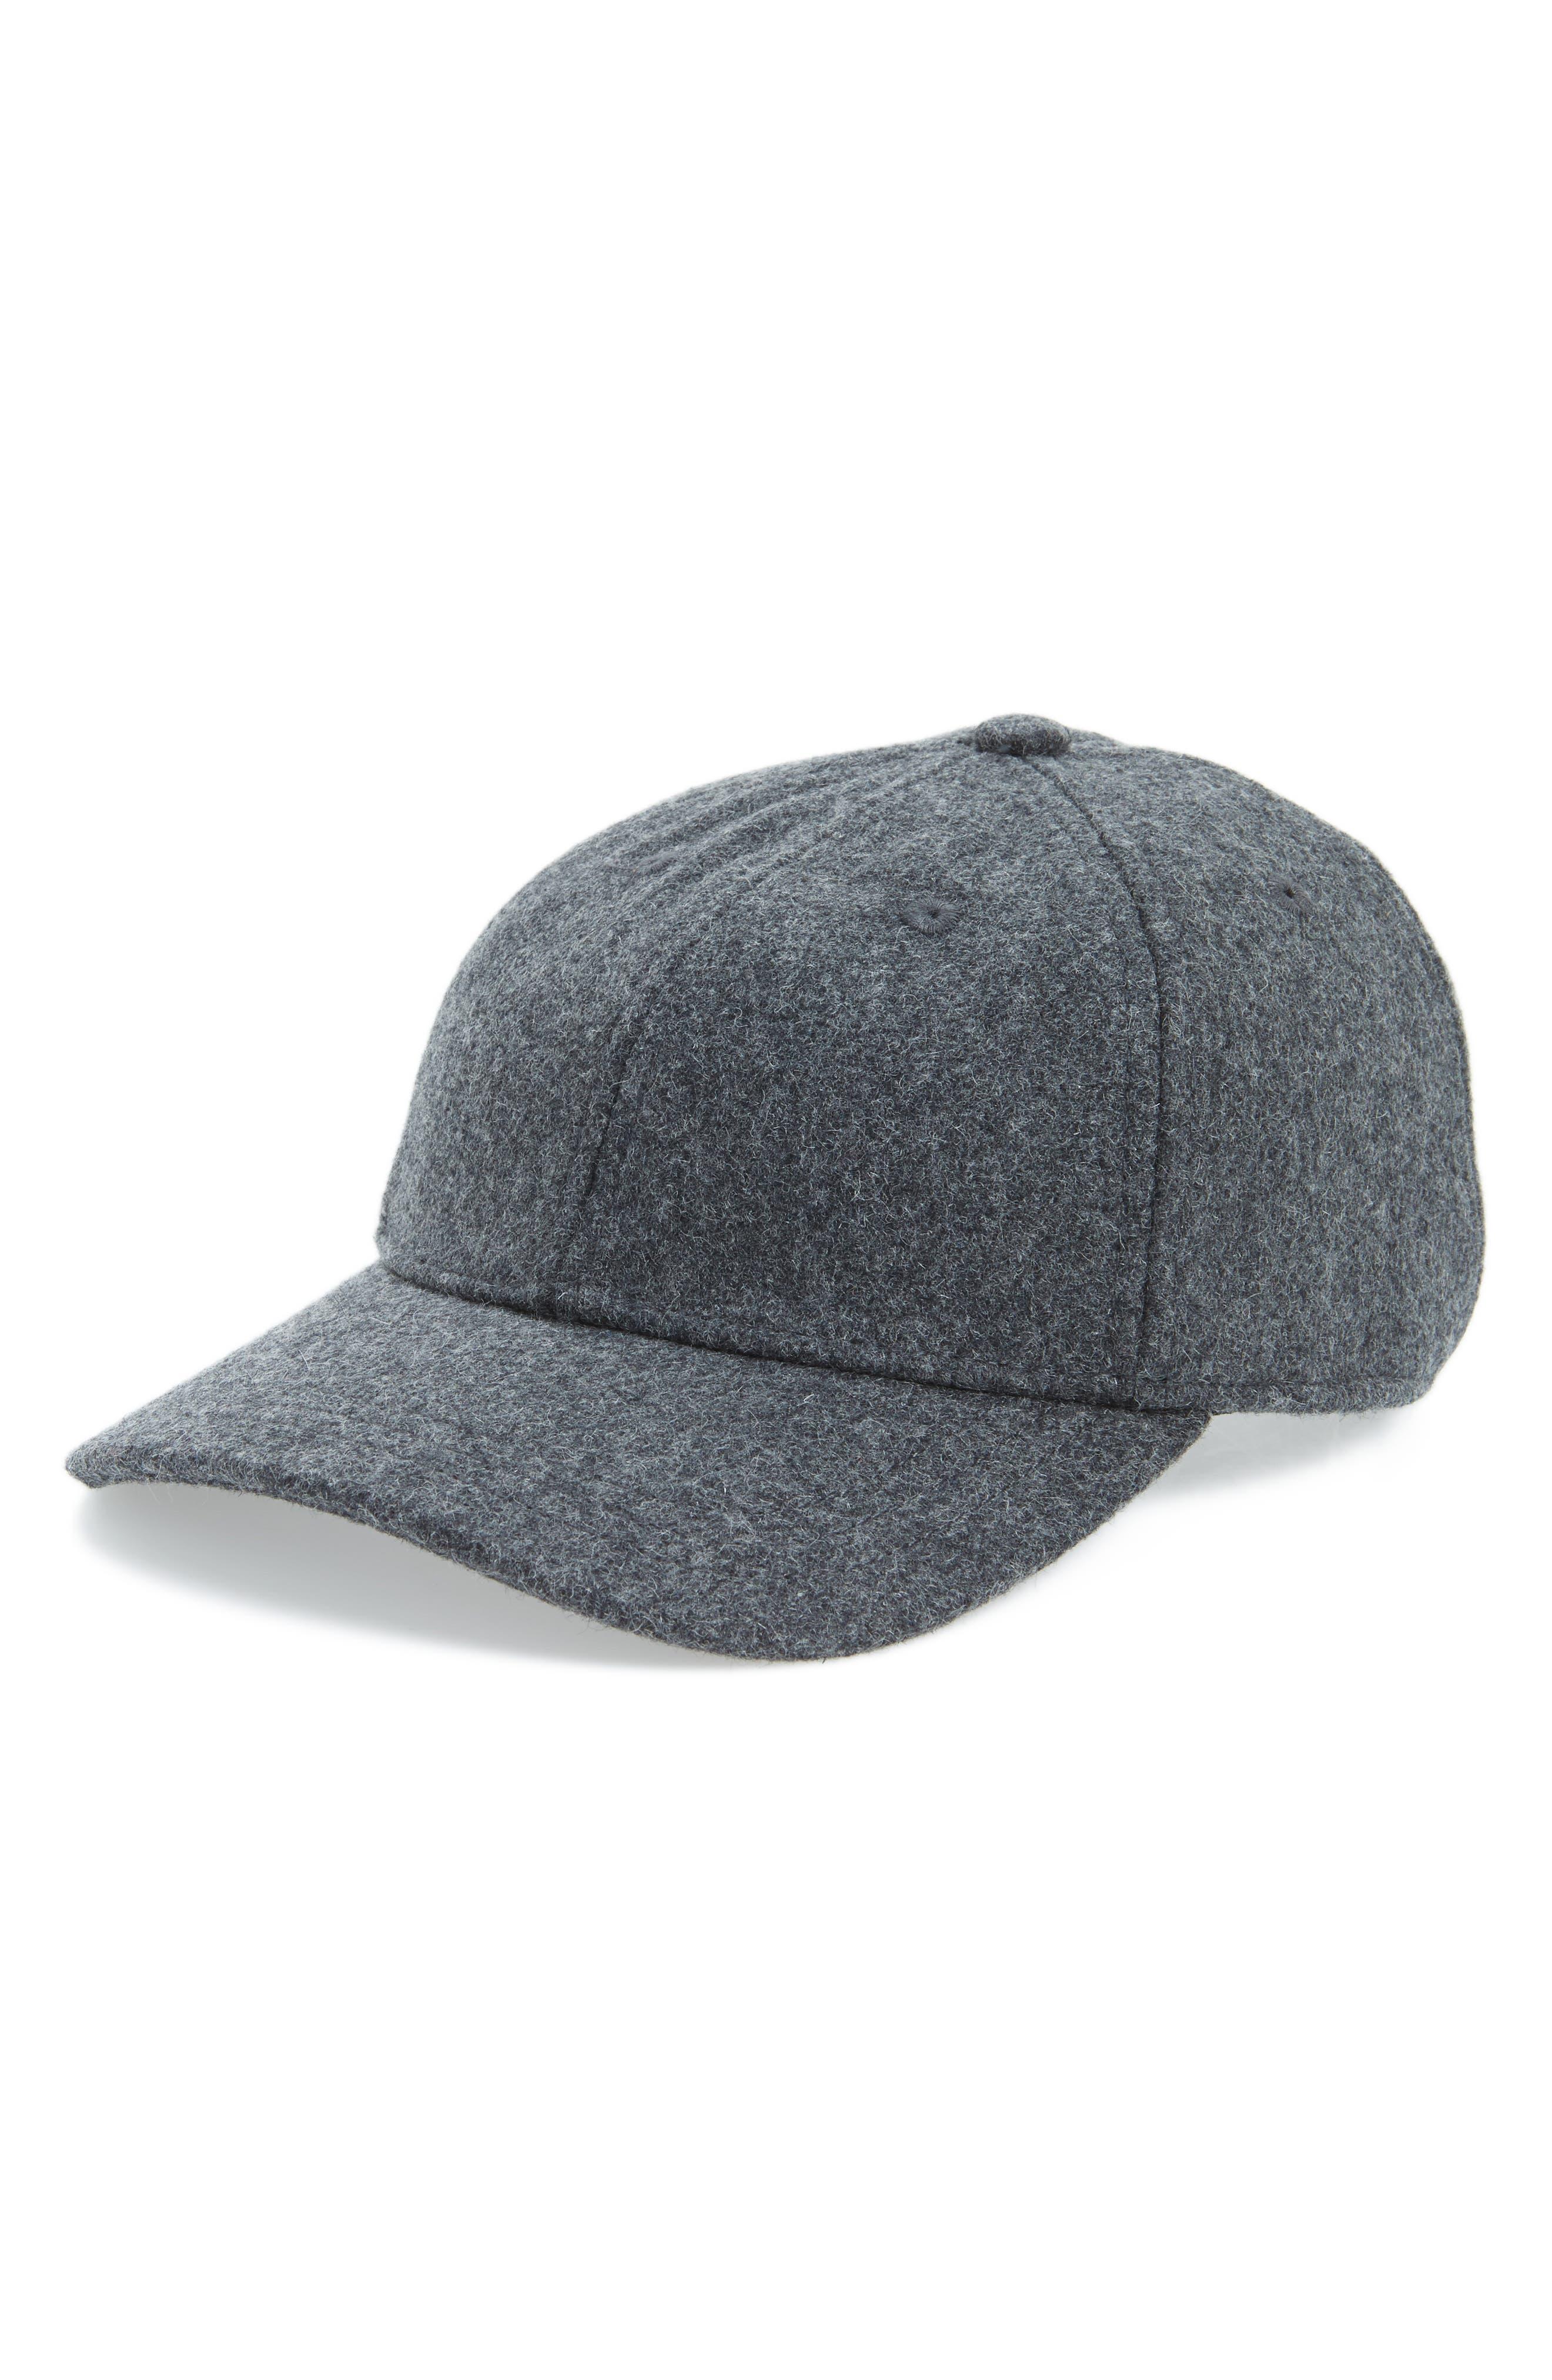 Wool Blend Baseball Hat,                             Main thumbnail 1, color,                             001